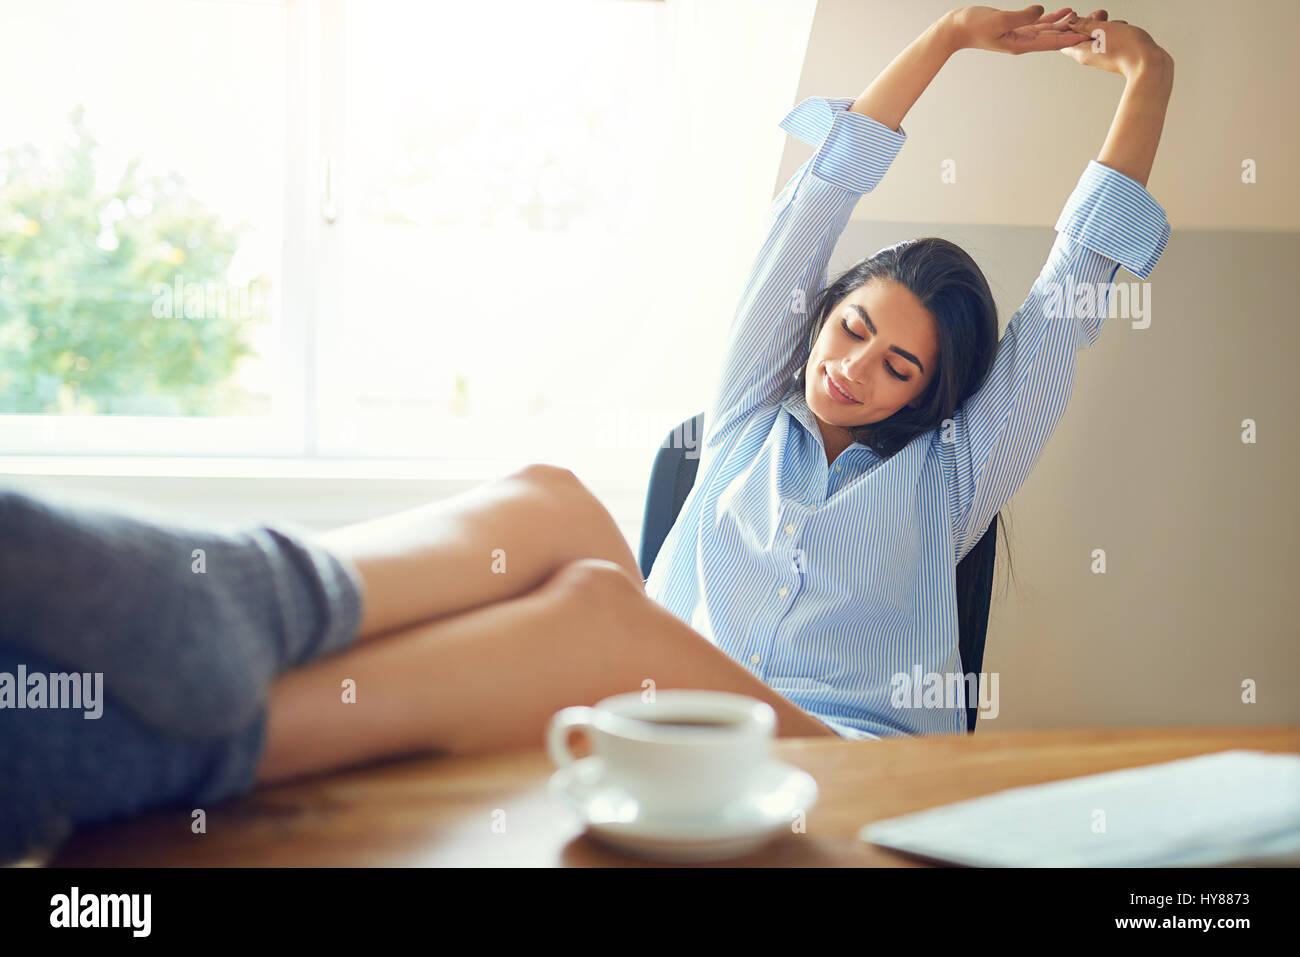 Business woman relaxing feet on immagini business woman for Immagini di casa di 2000 piedi quadrati